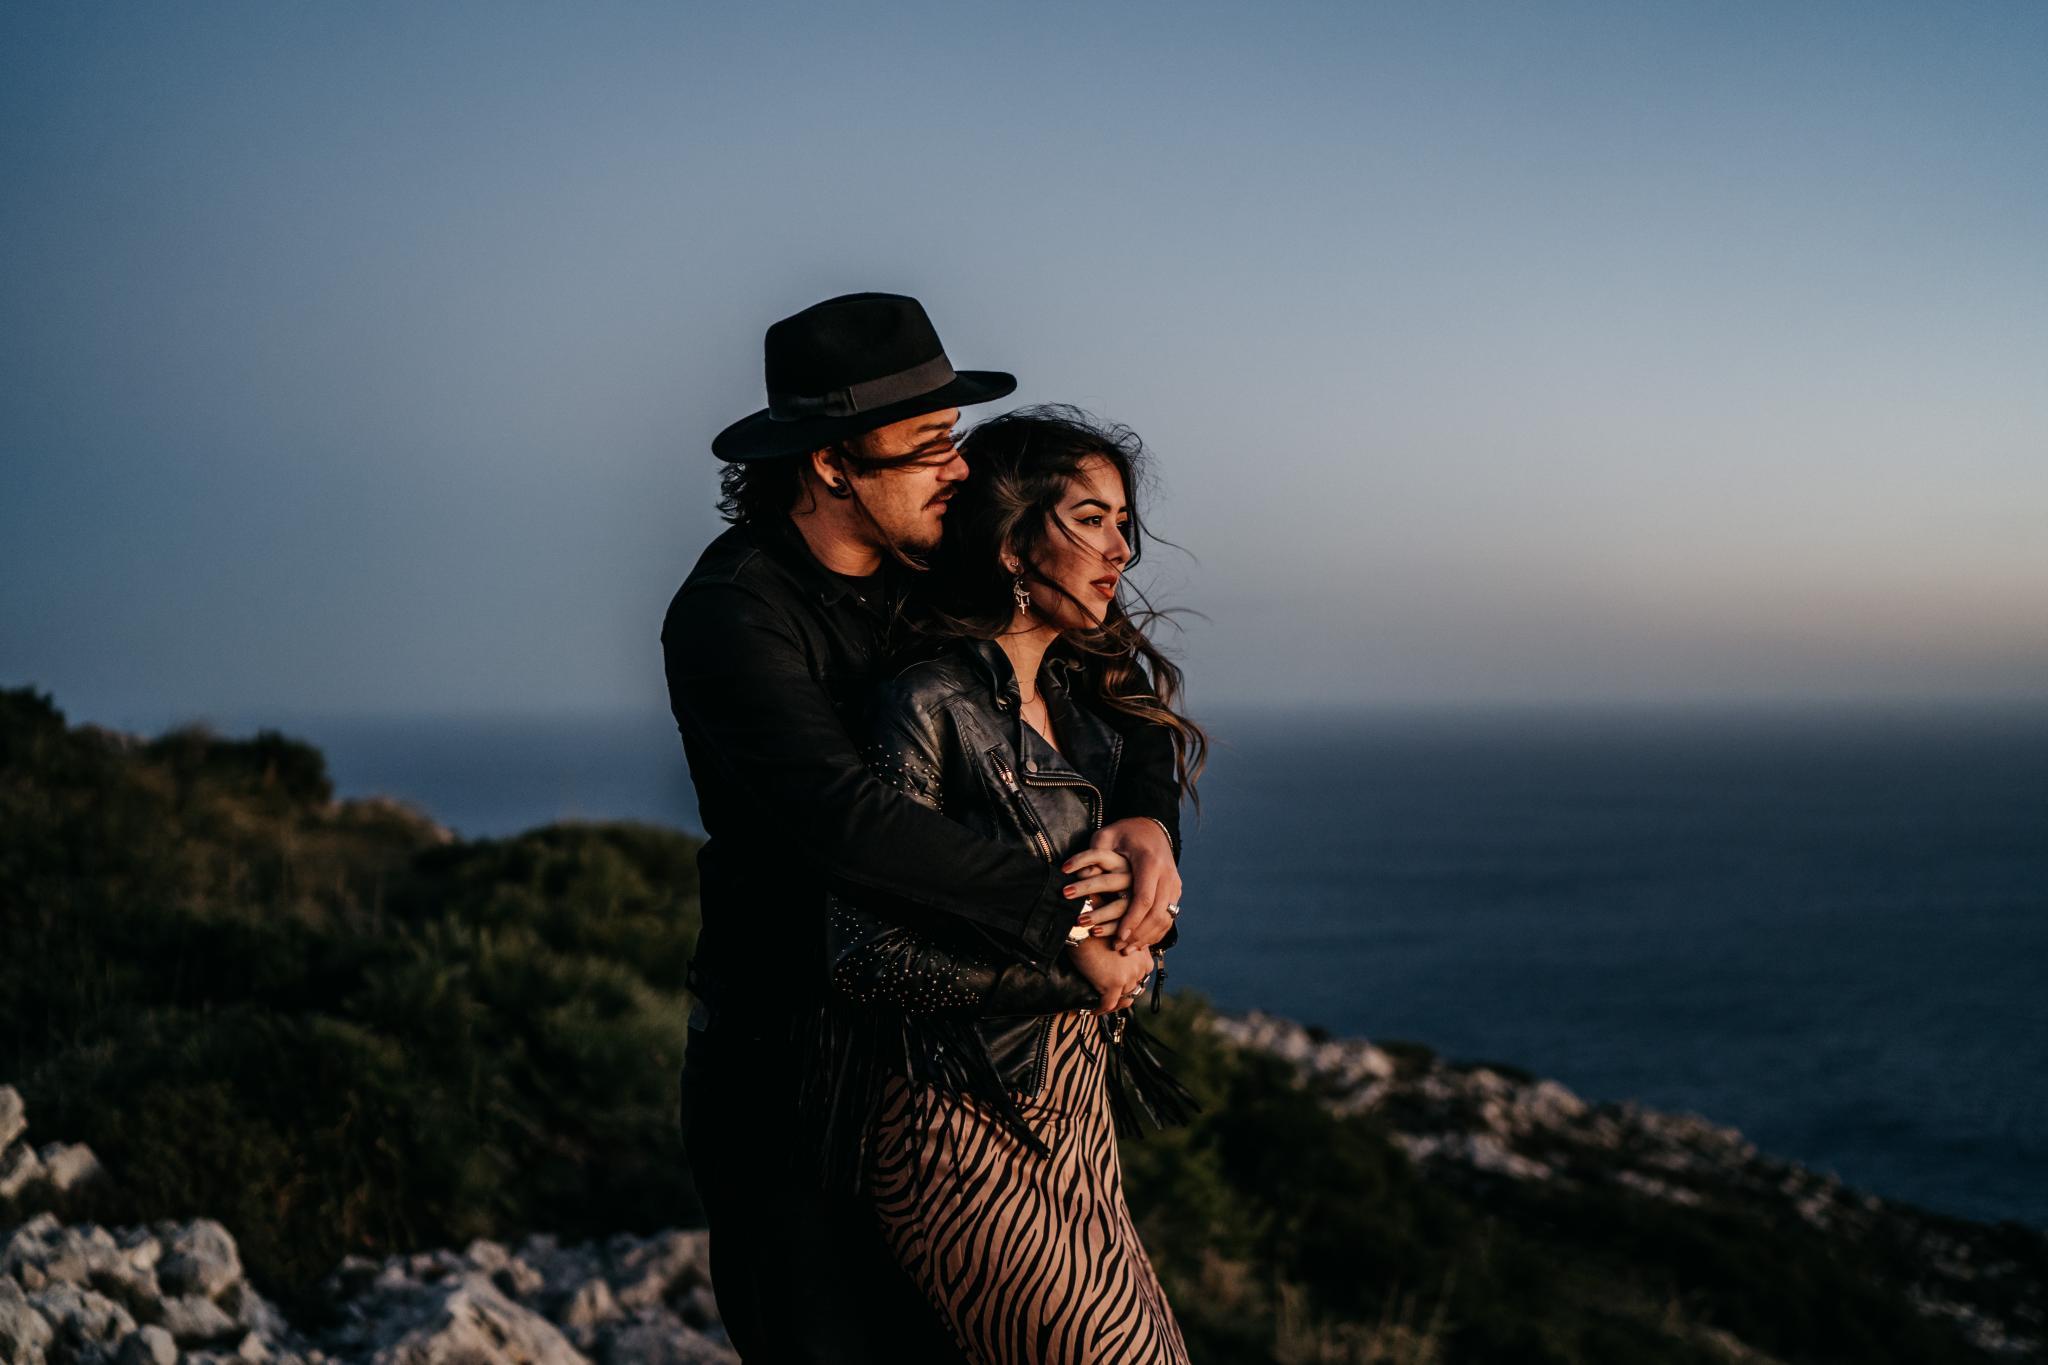 Sunrise Shoot auf Mallorca Verlobung